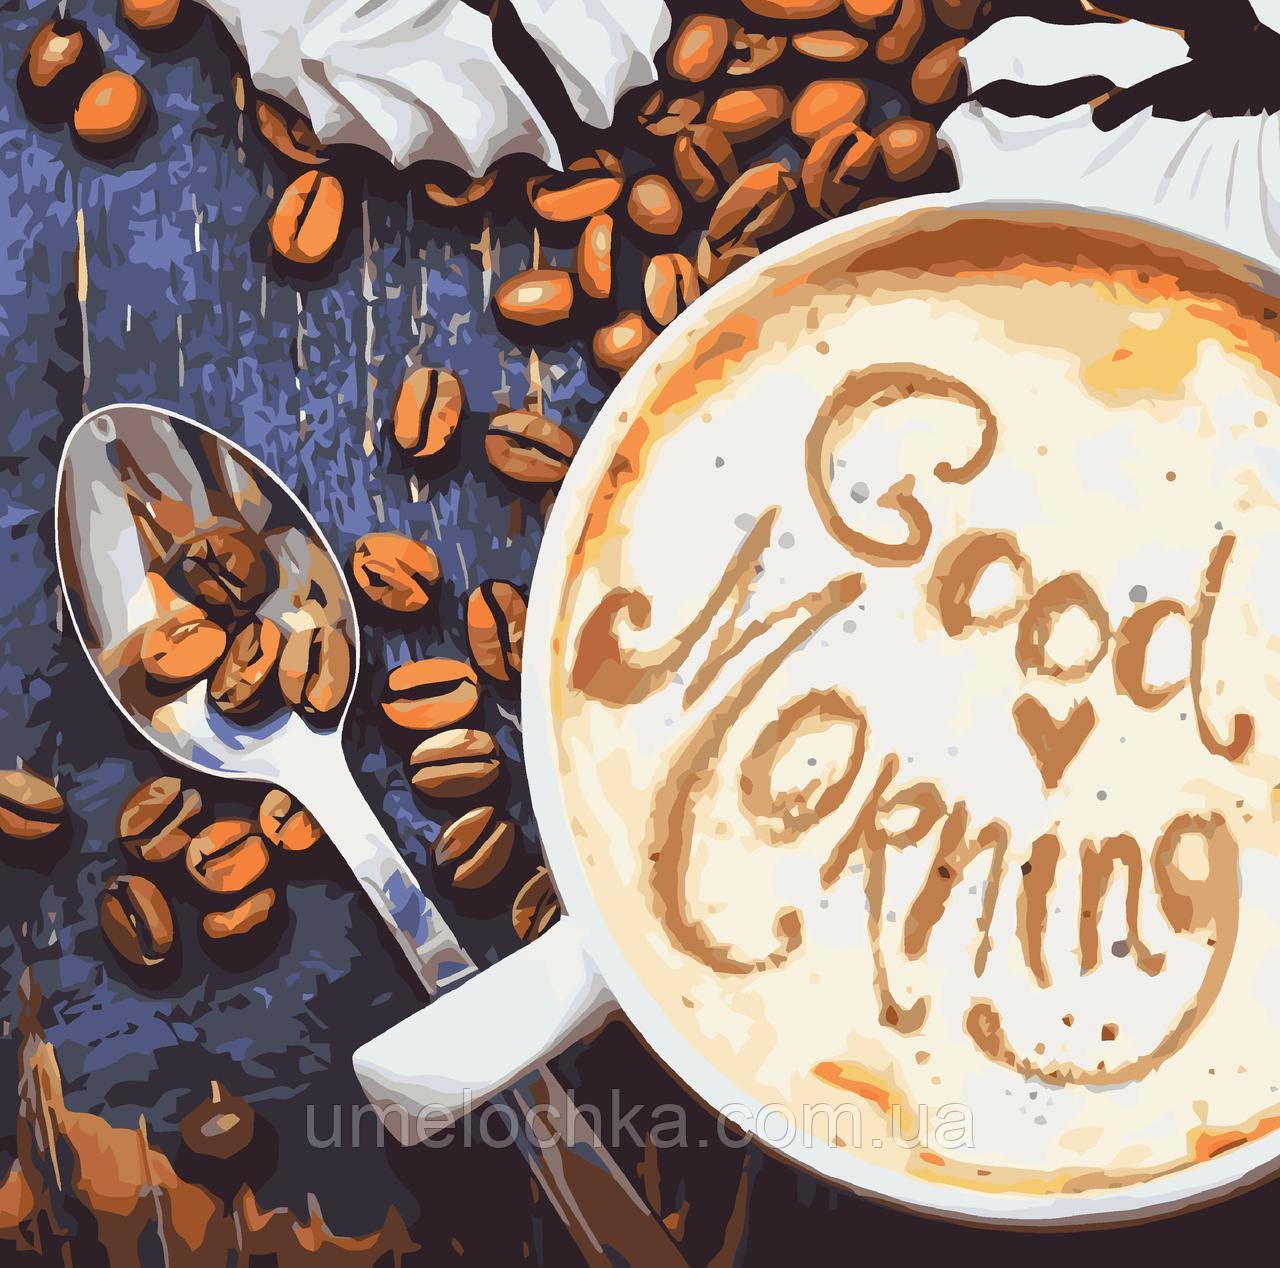 Картина по номерам Good Morning (KHO5523) 40 х 40 см Идейка (Без коробки)